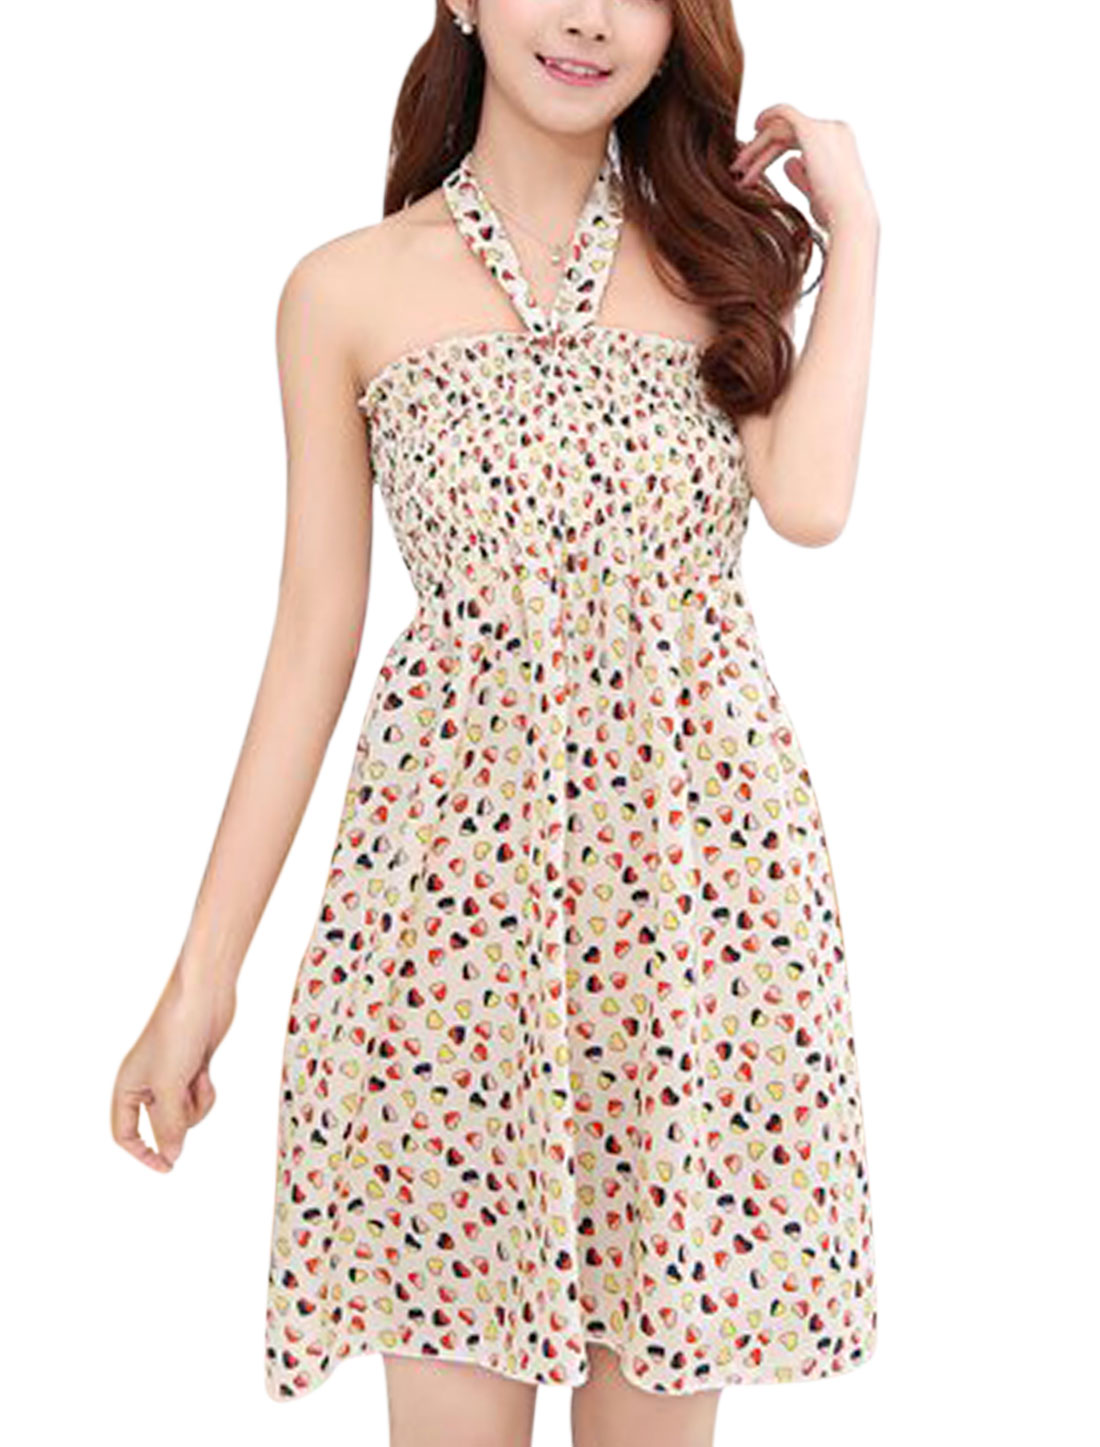 Women Halter Neck Hearts Print Smocked Bust Ruched Summer Dress Beige Yellow S